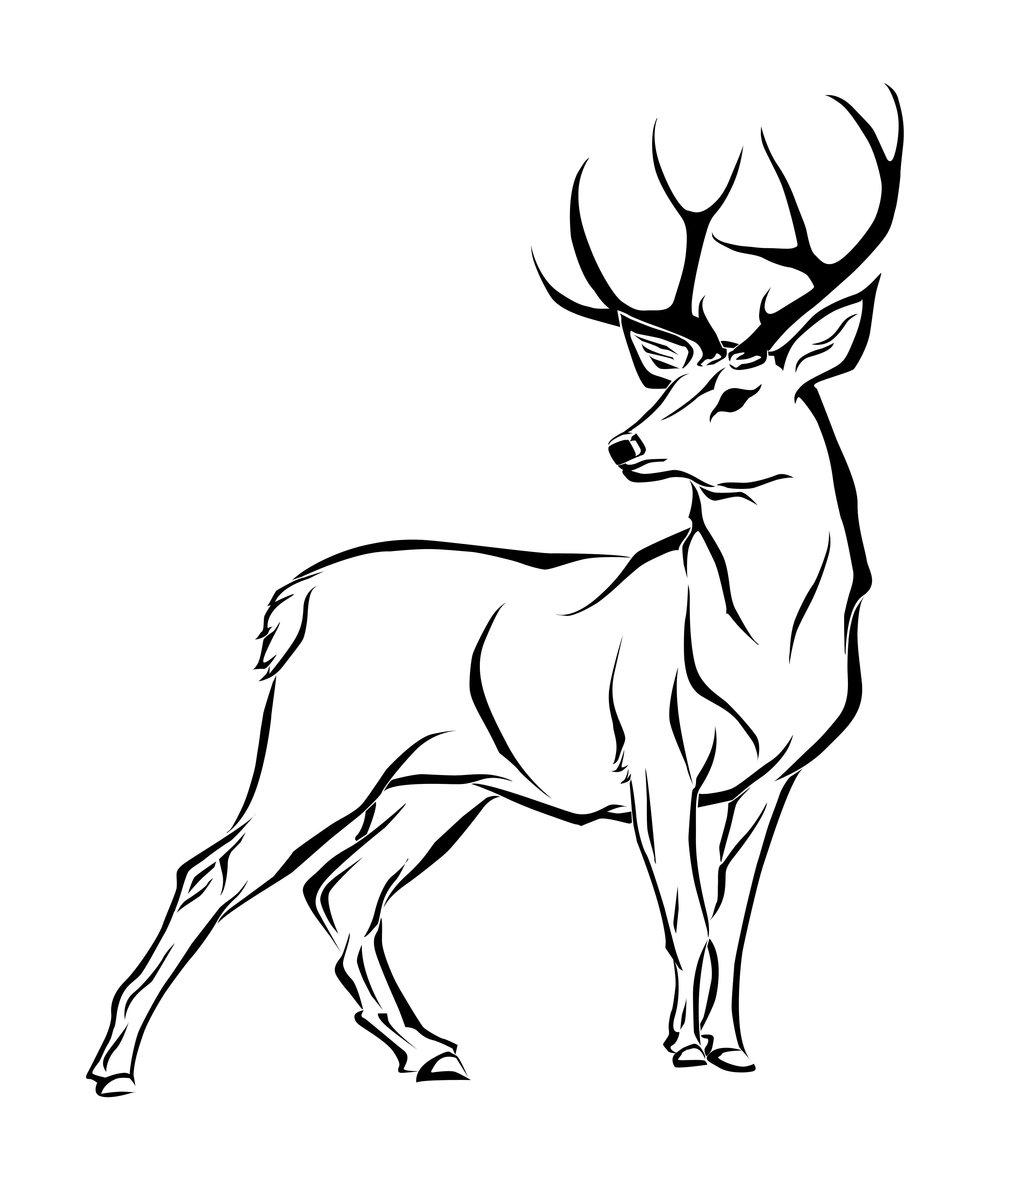 Free Deer, Download Free Clip Art, Free Clip Art on